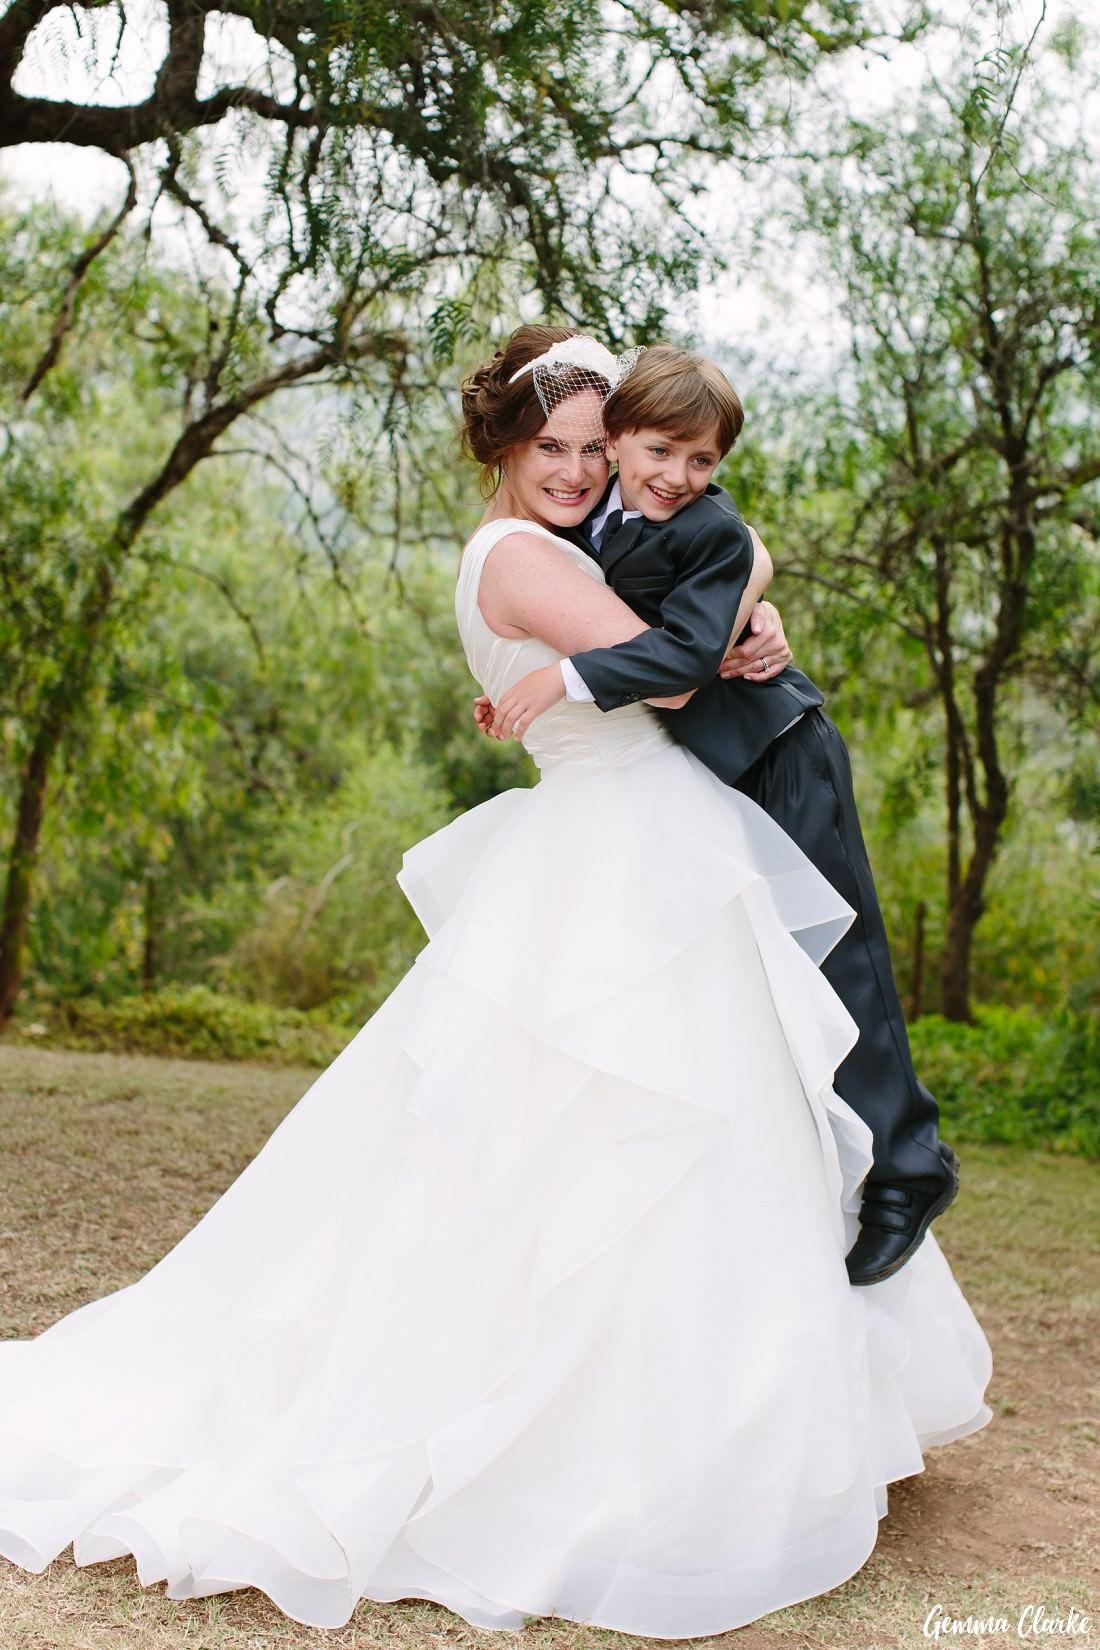 peppertree-ridge-wedding_razorback_gemma-clarke-photography-0047